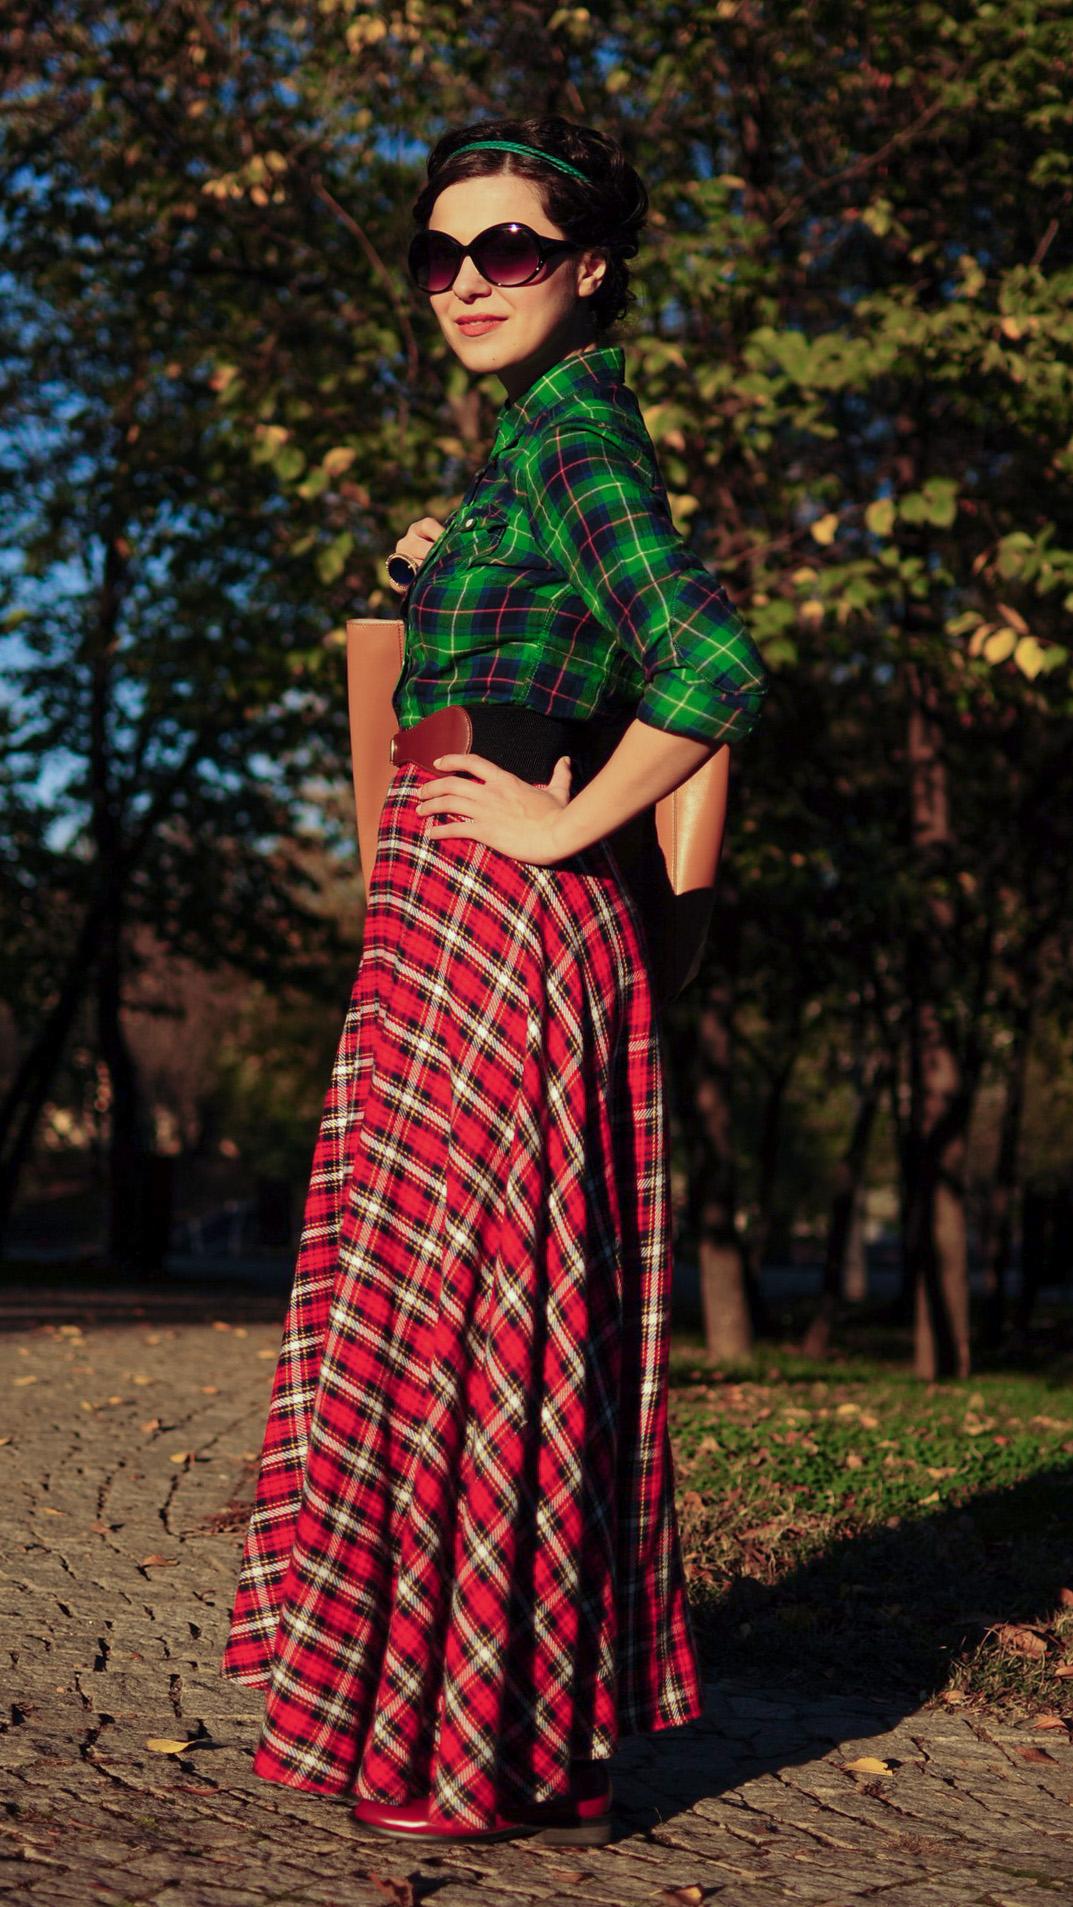 tartan maxi skirt tartan shirt green burgundy maxi bag autumn fall leaves scenery